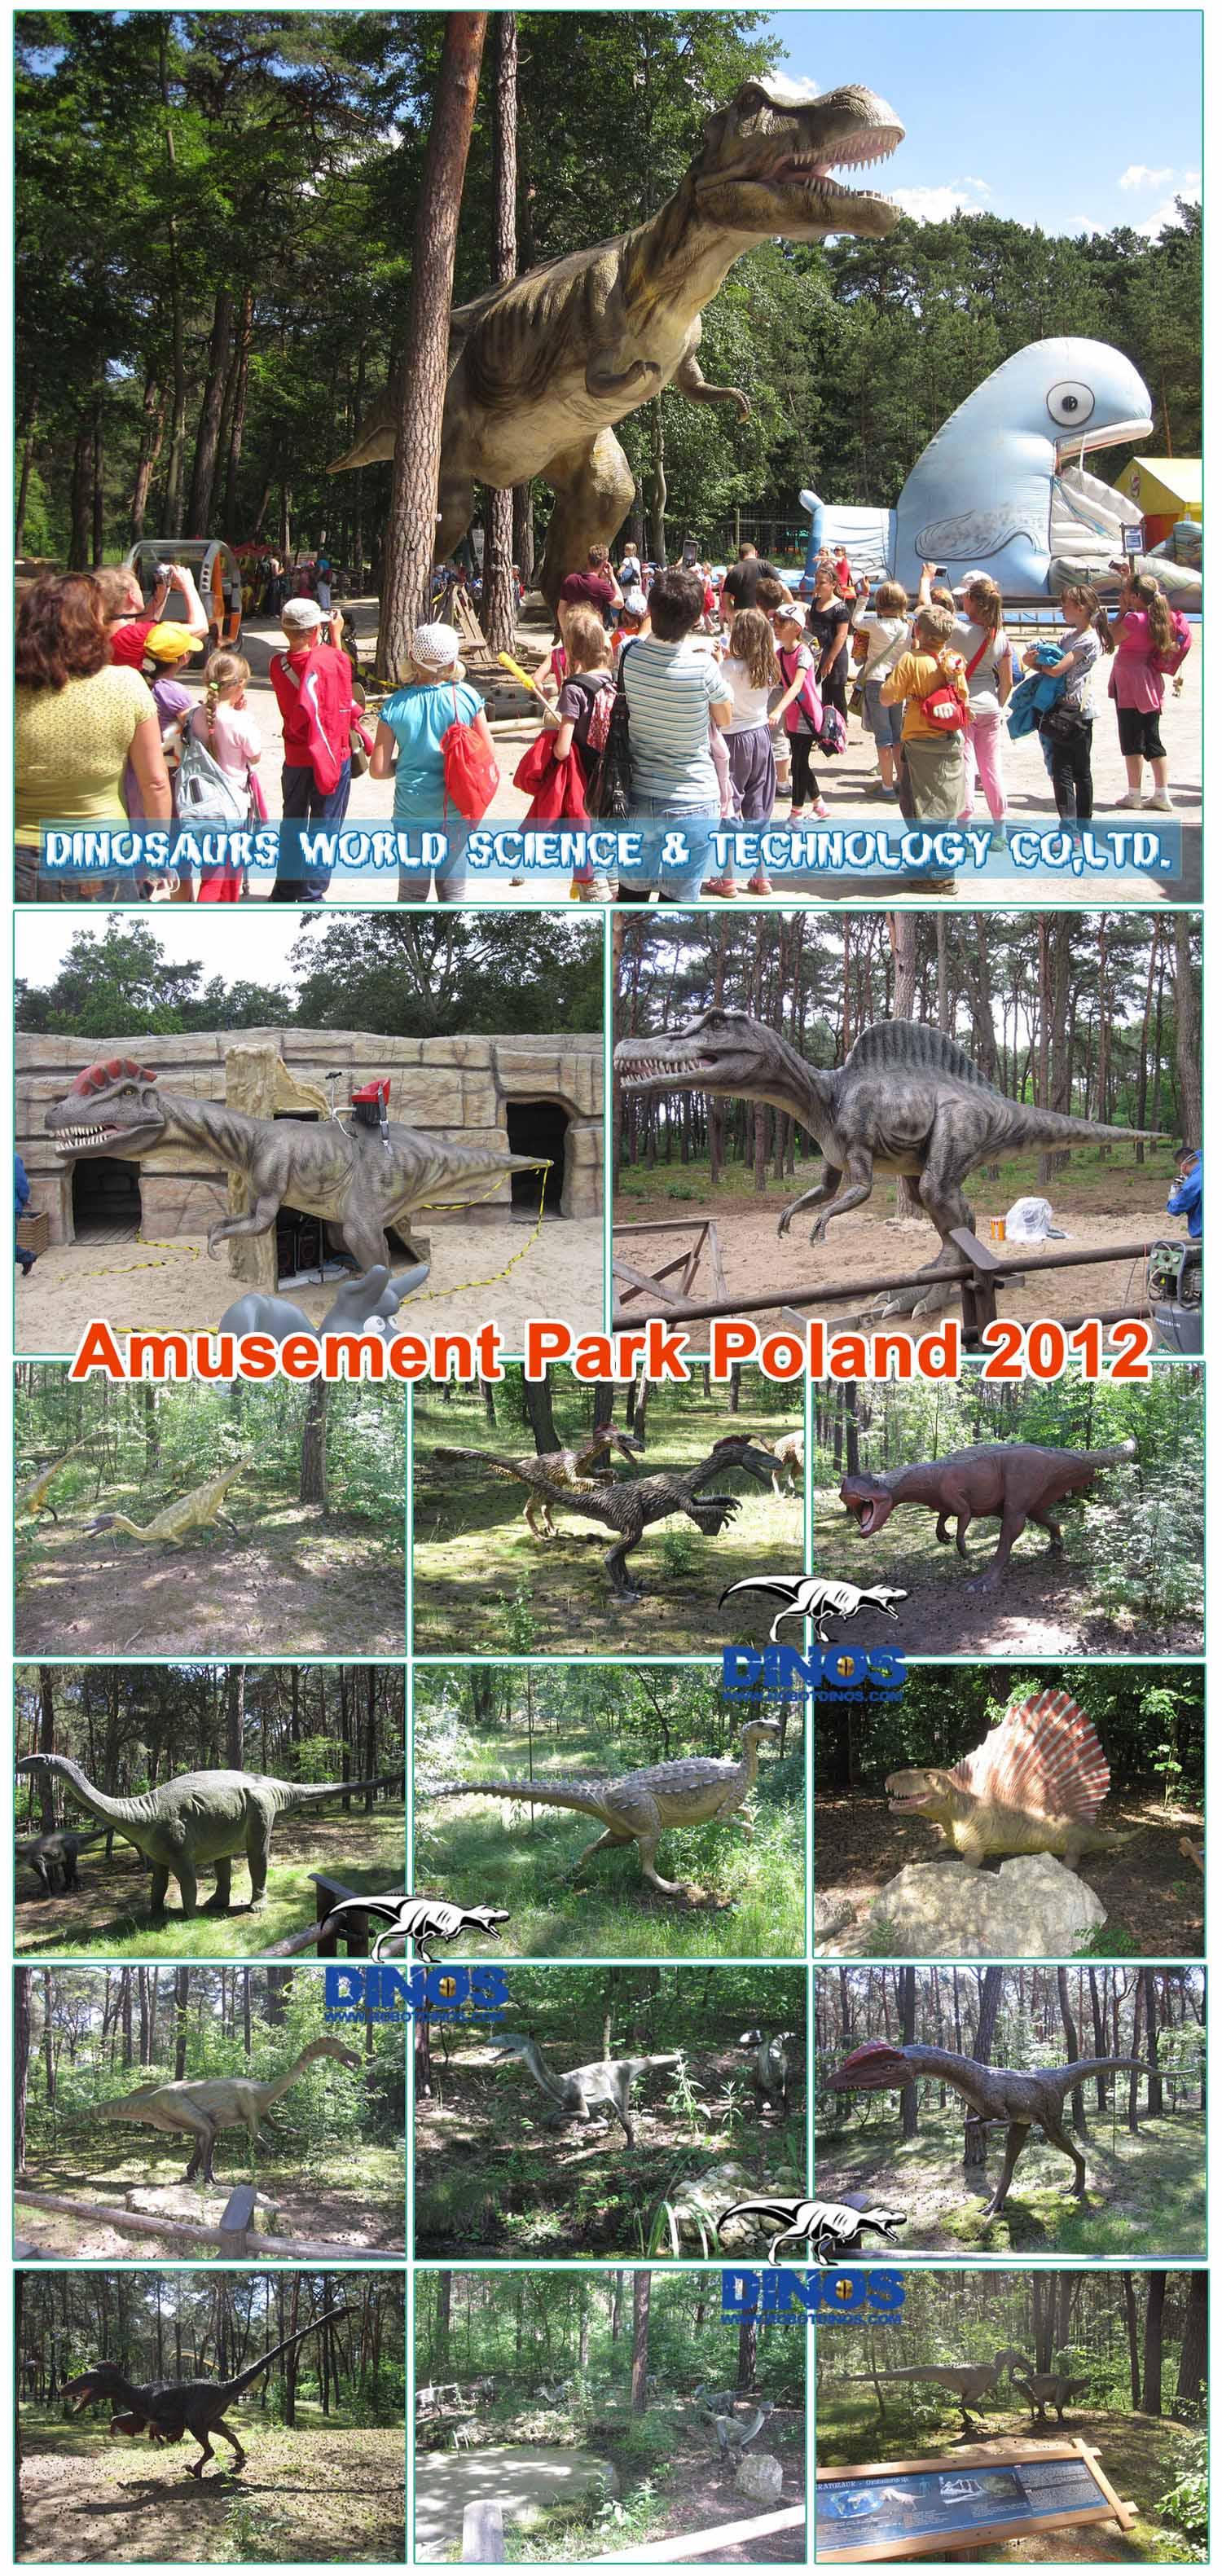 amusement park dinosaurs Poland 2012